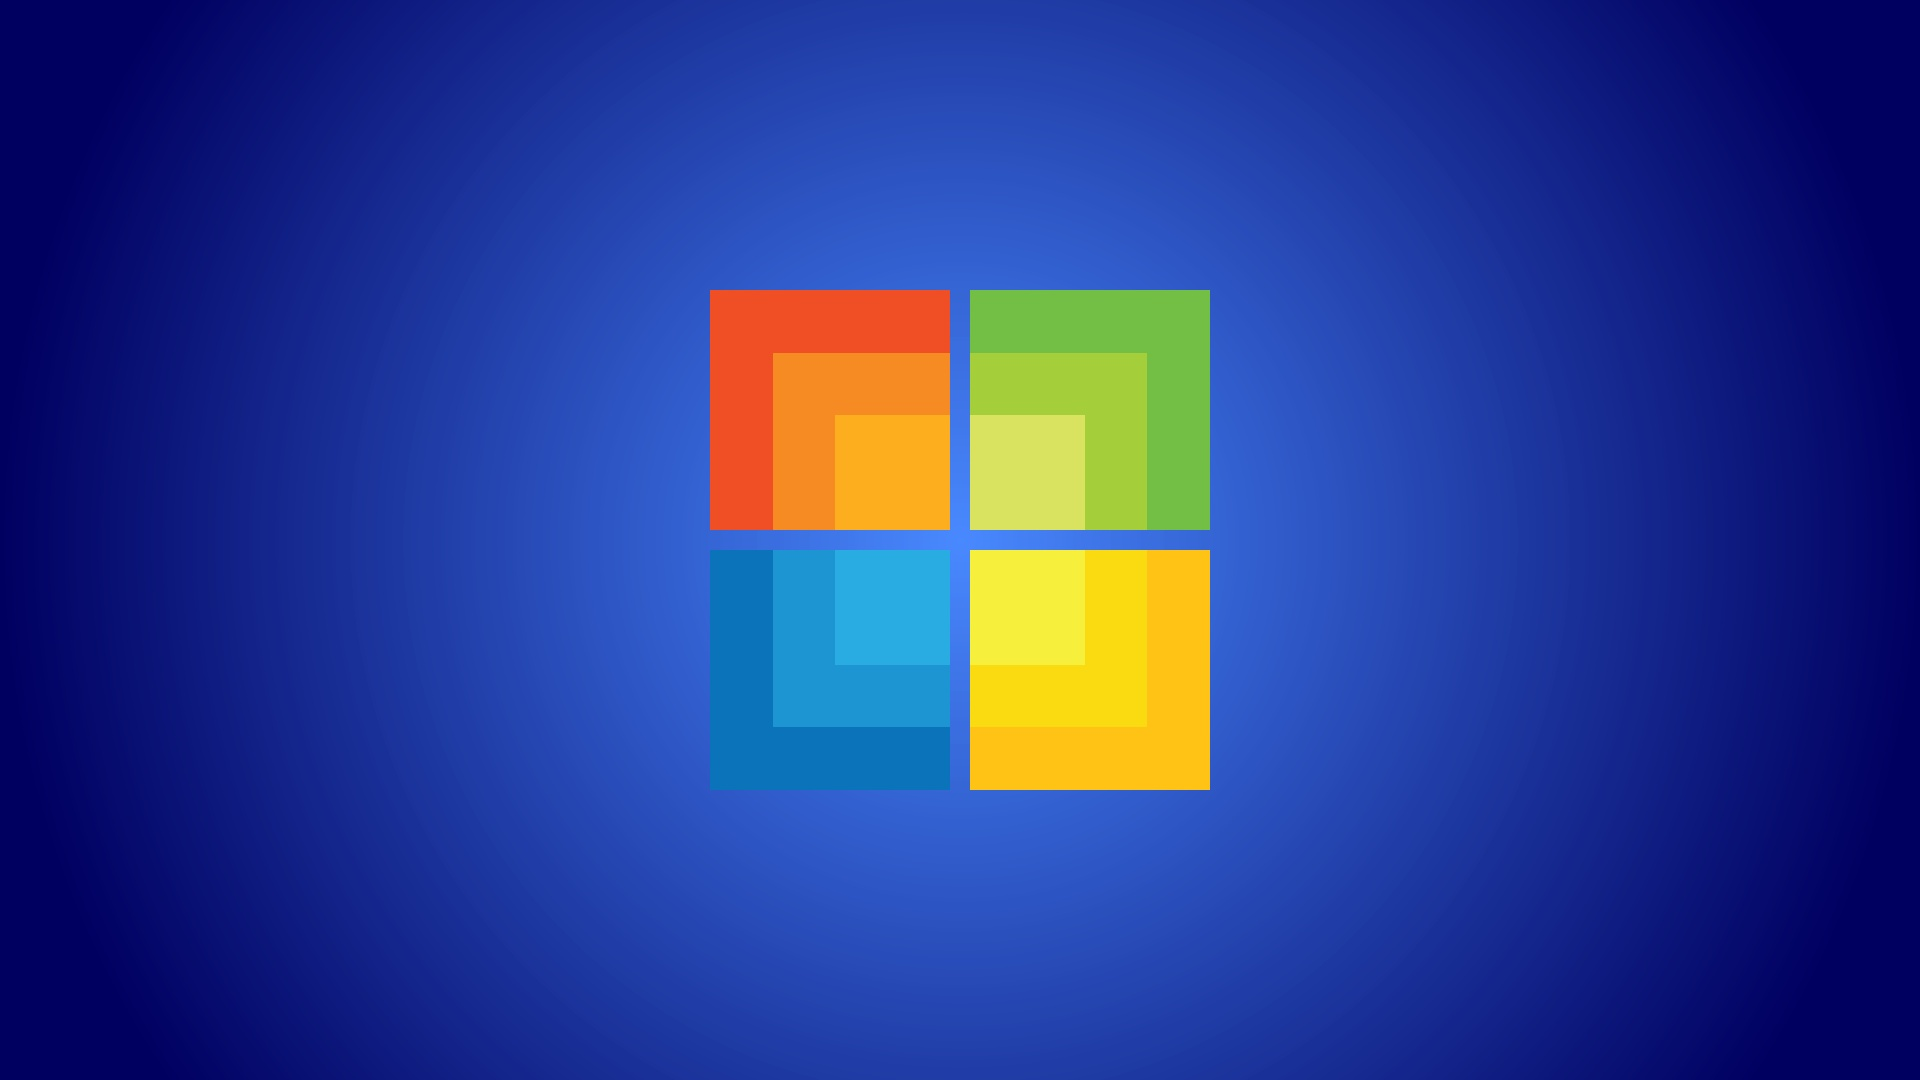 microsoft-windows-8-logo-version-wallpapers_34379_1920x1080